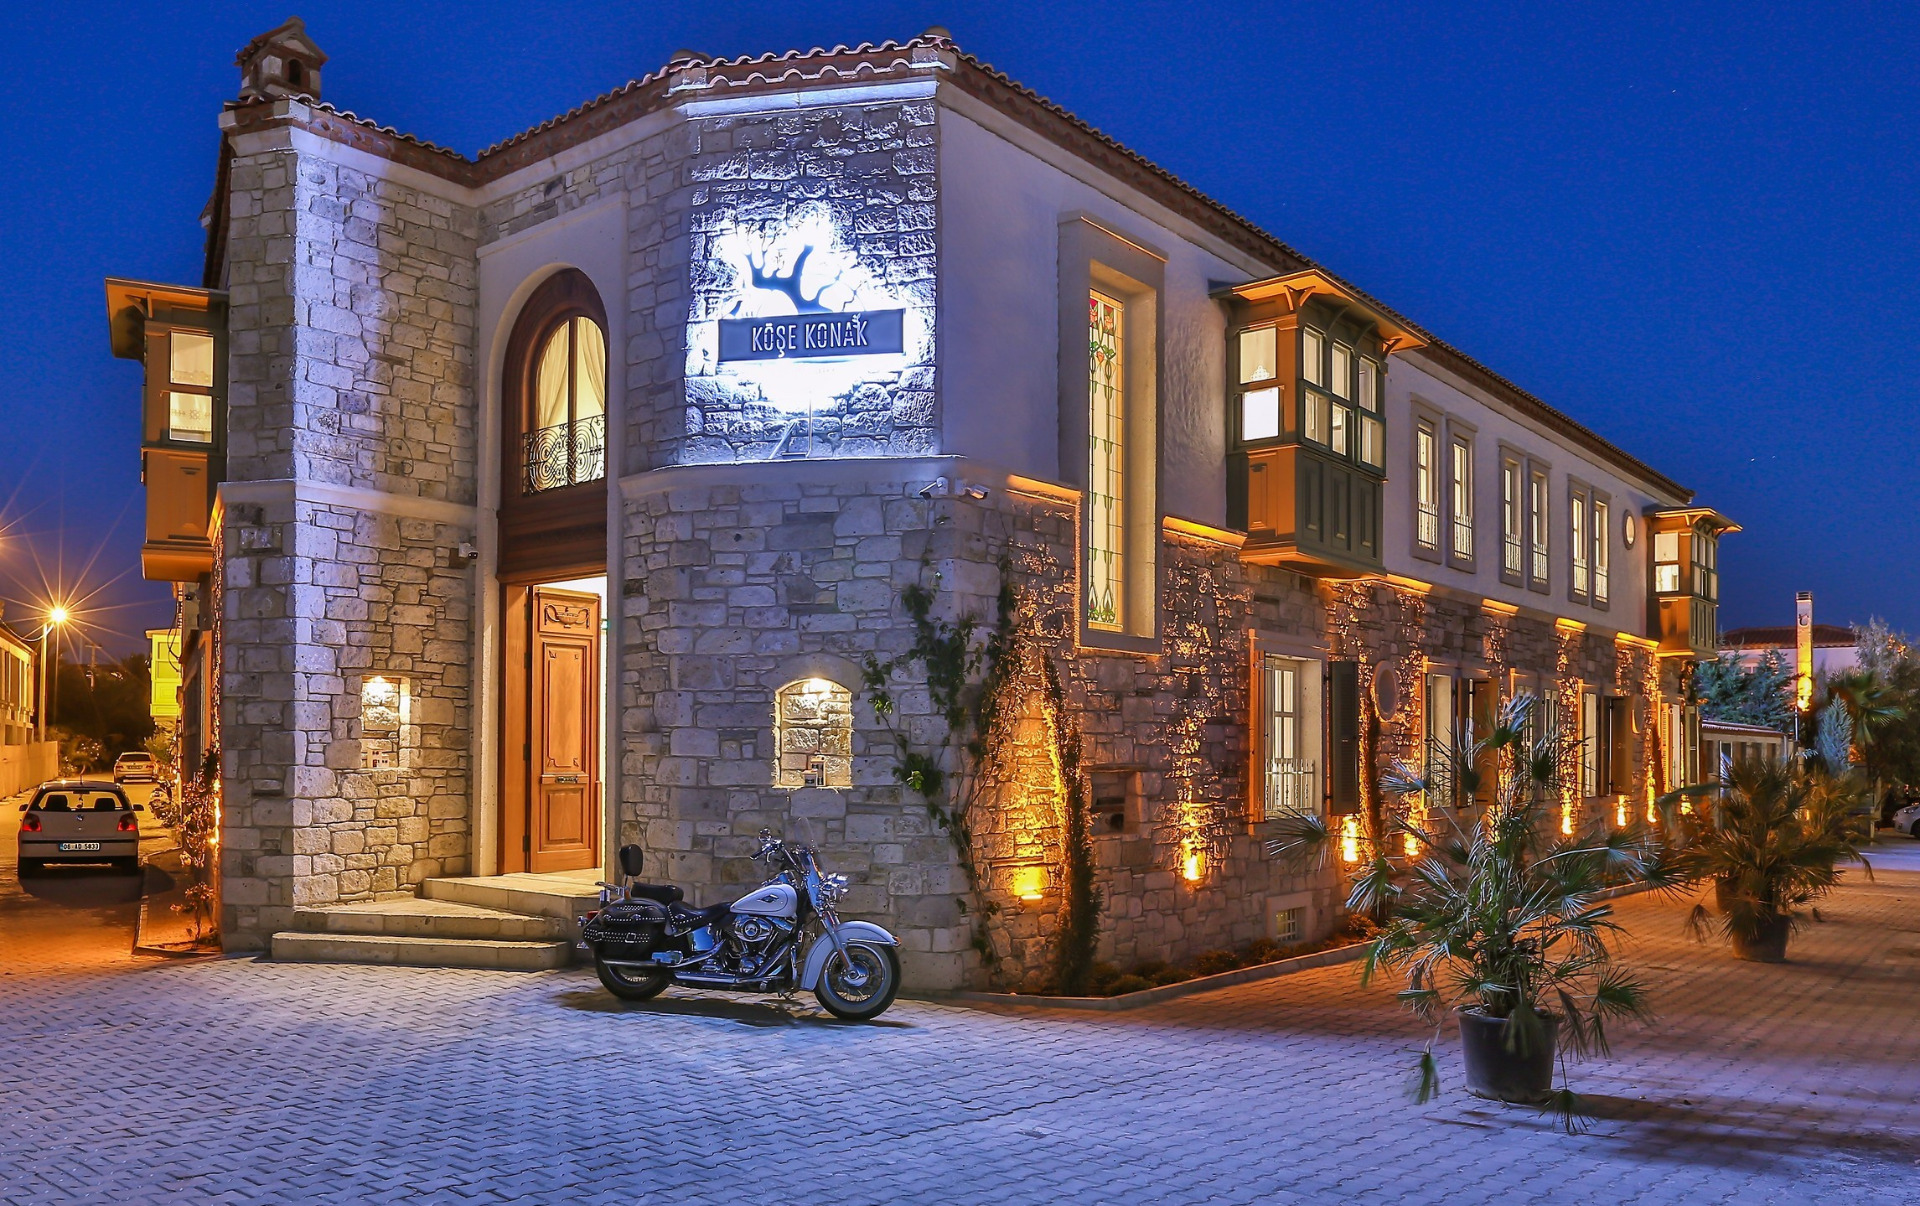 Sultan konak hotel alacati izmir turkey small boutique for Design boutique hotel alacati